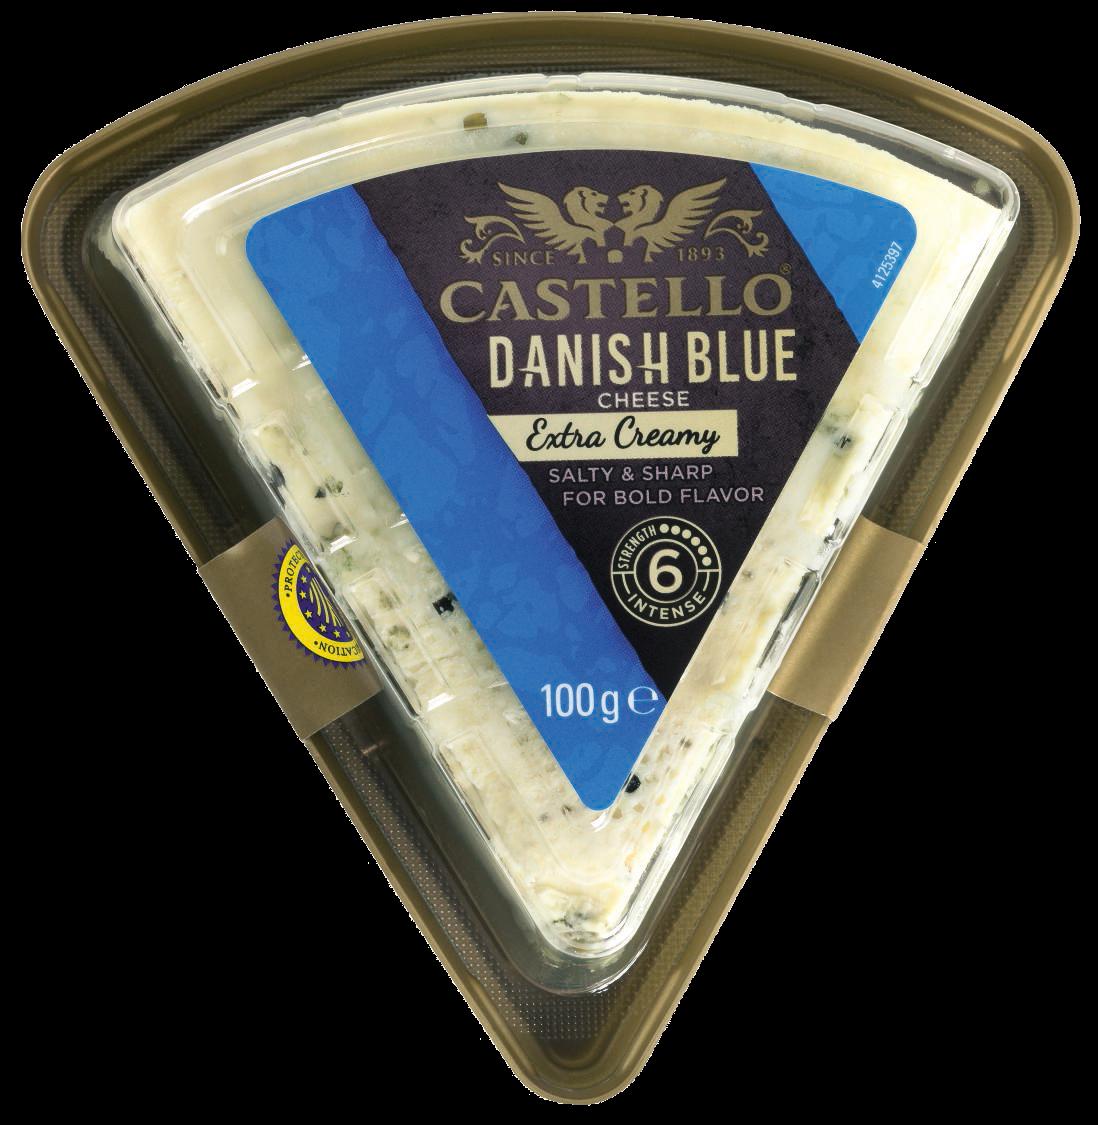 Castello® Extra Creamy Danish Blue, 100g